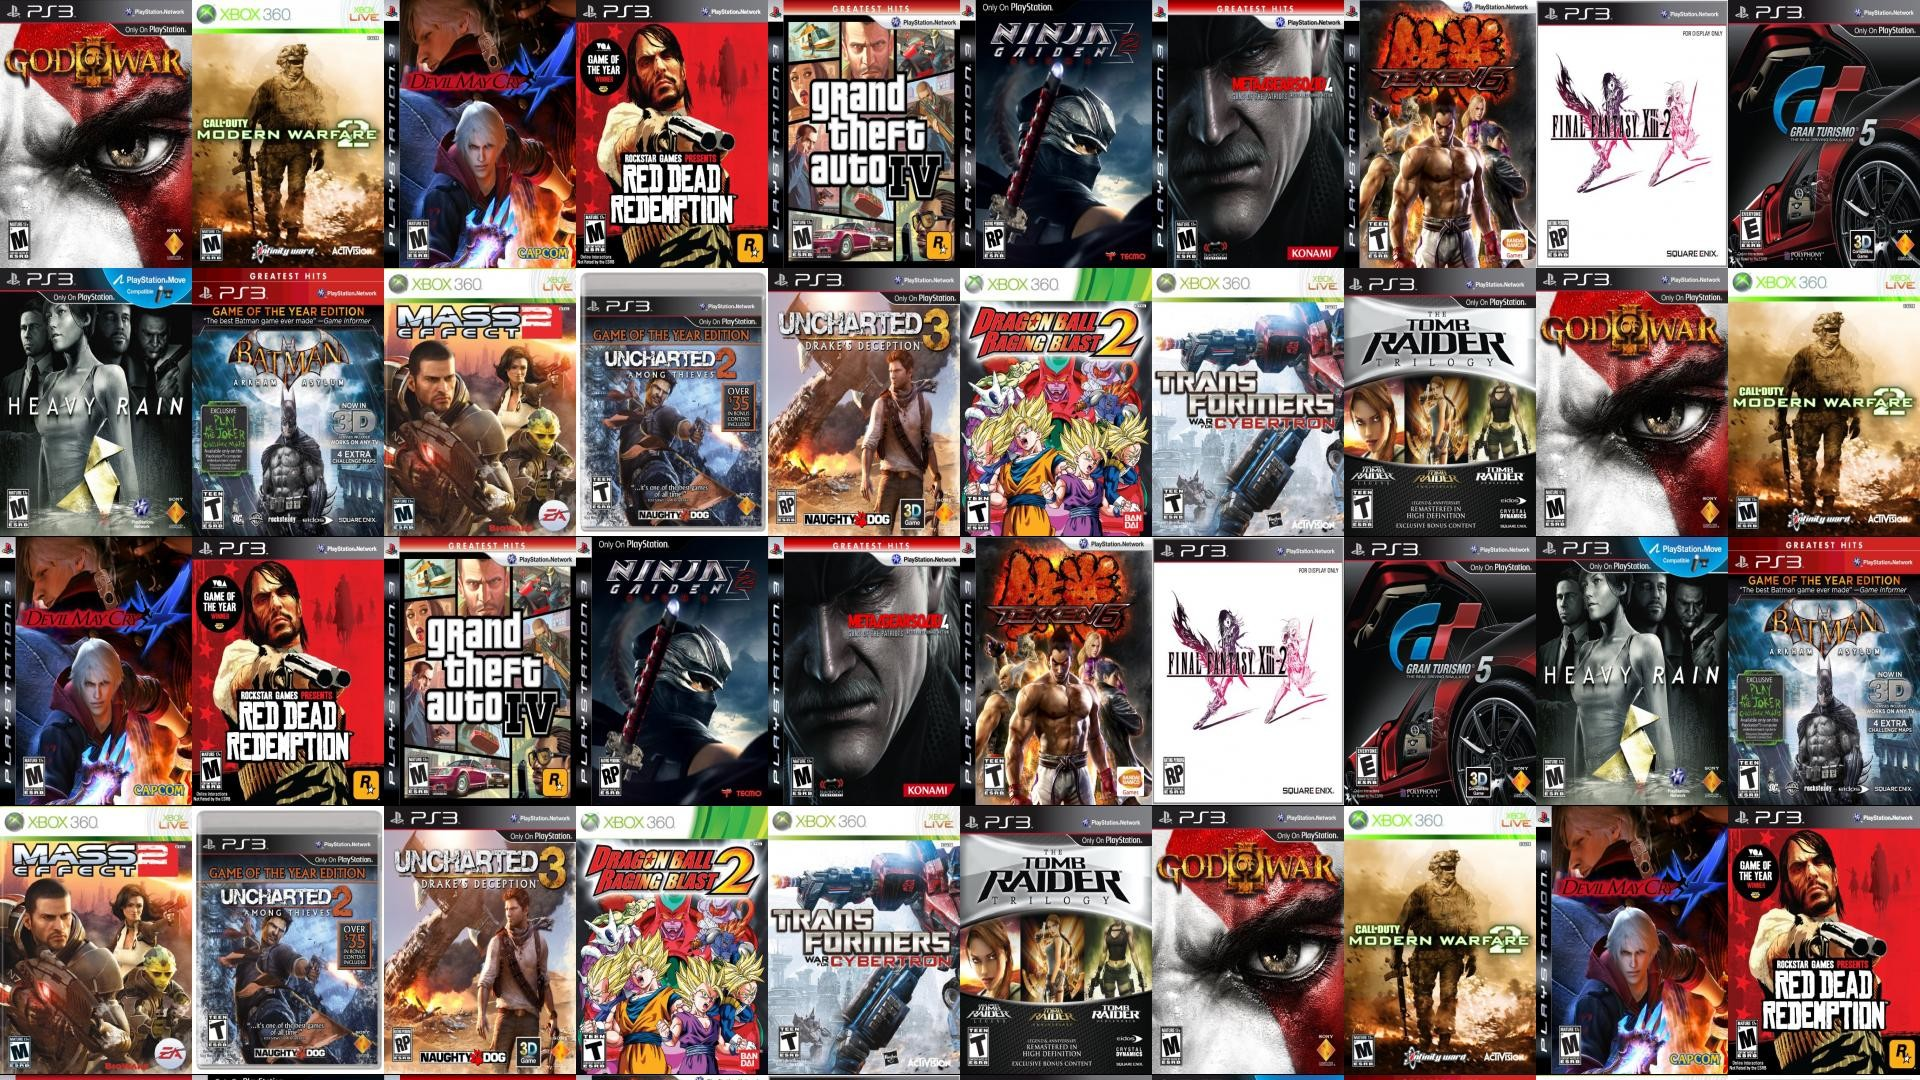 God War Modern Warfare Devil May Cry Red Wallpaper Â« Tiled Desktop Wallpaper